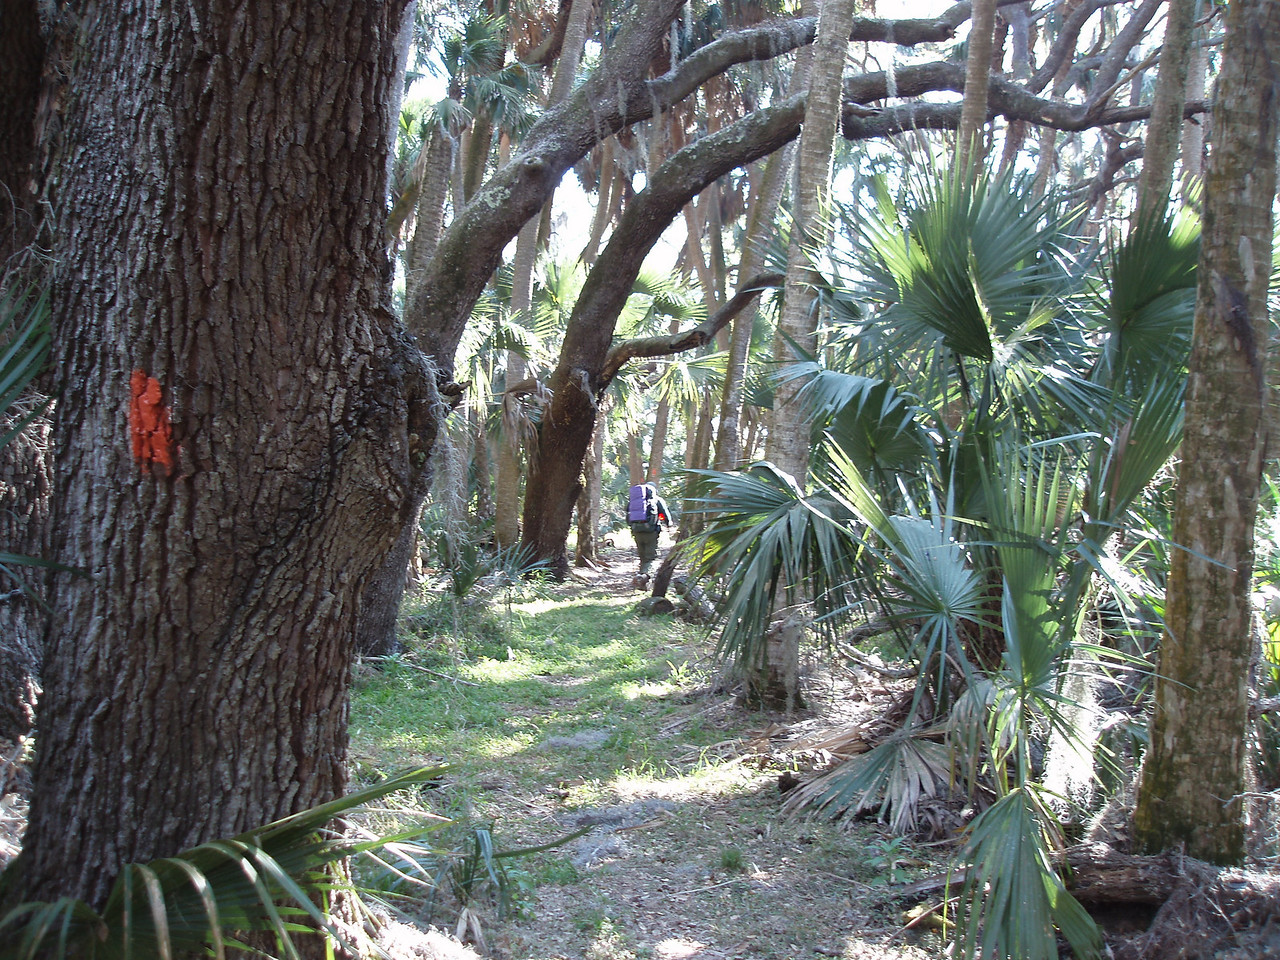 In a shady hammock<br /> PHOTO CREDIT: Robert Coveney / Florida Trail Association